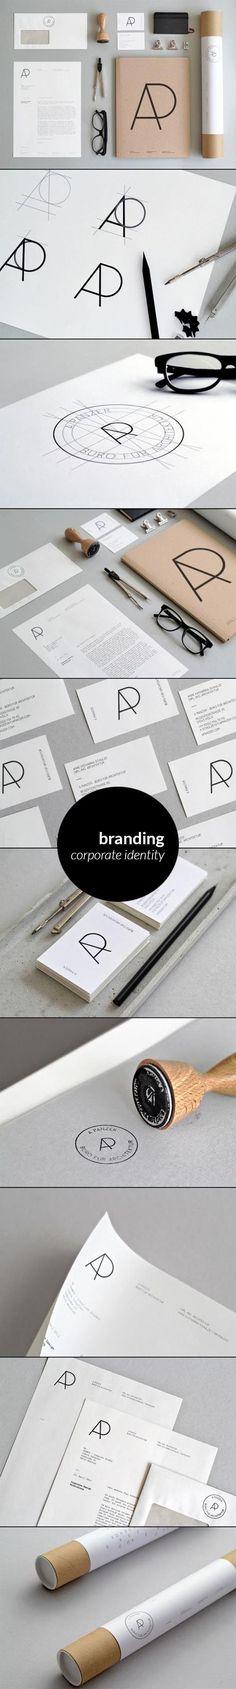 Logotipos                                                       …